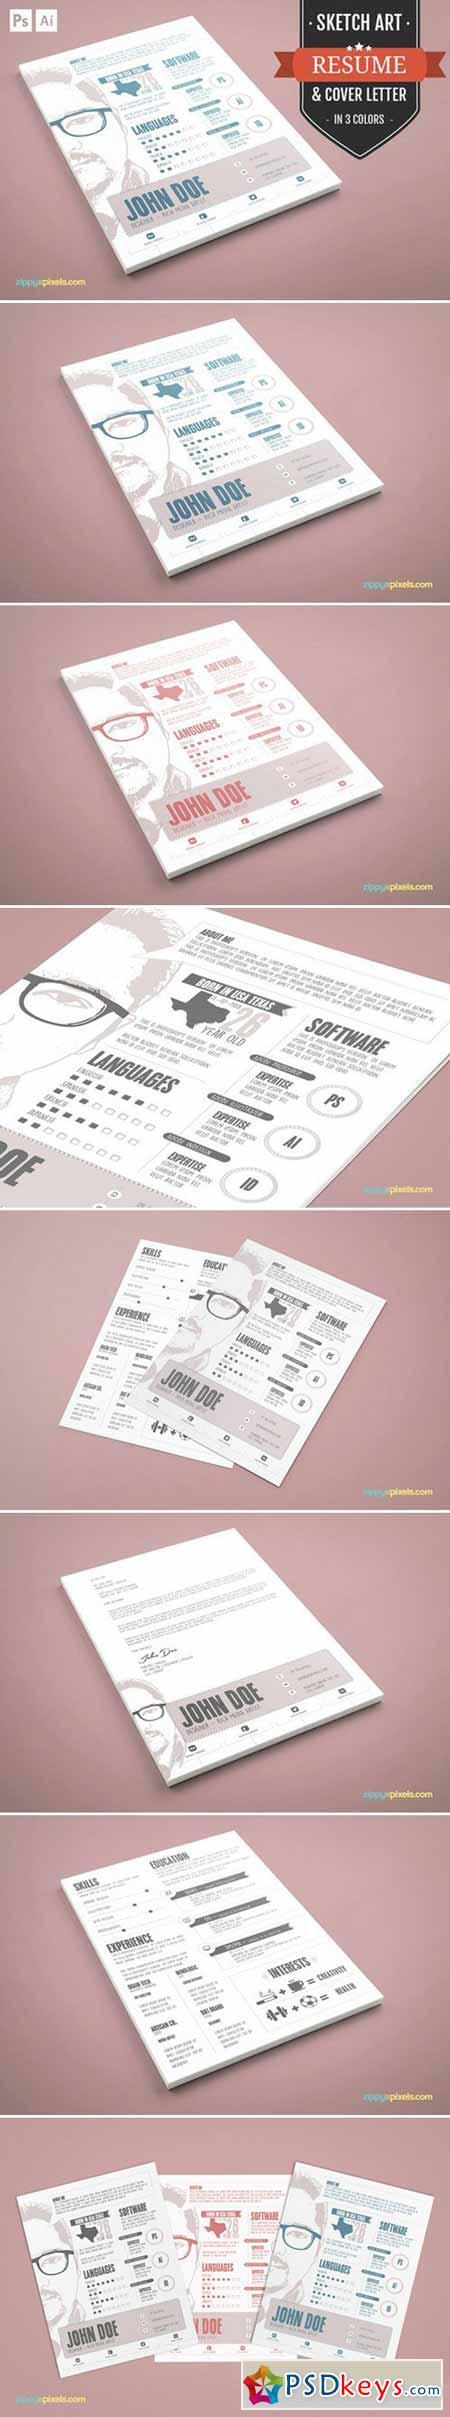 Graphic Designer Resume CV Template 394675